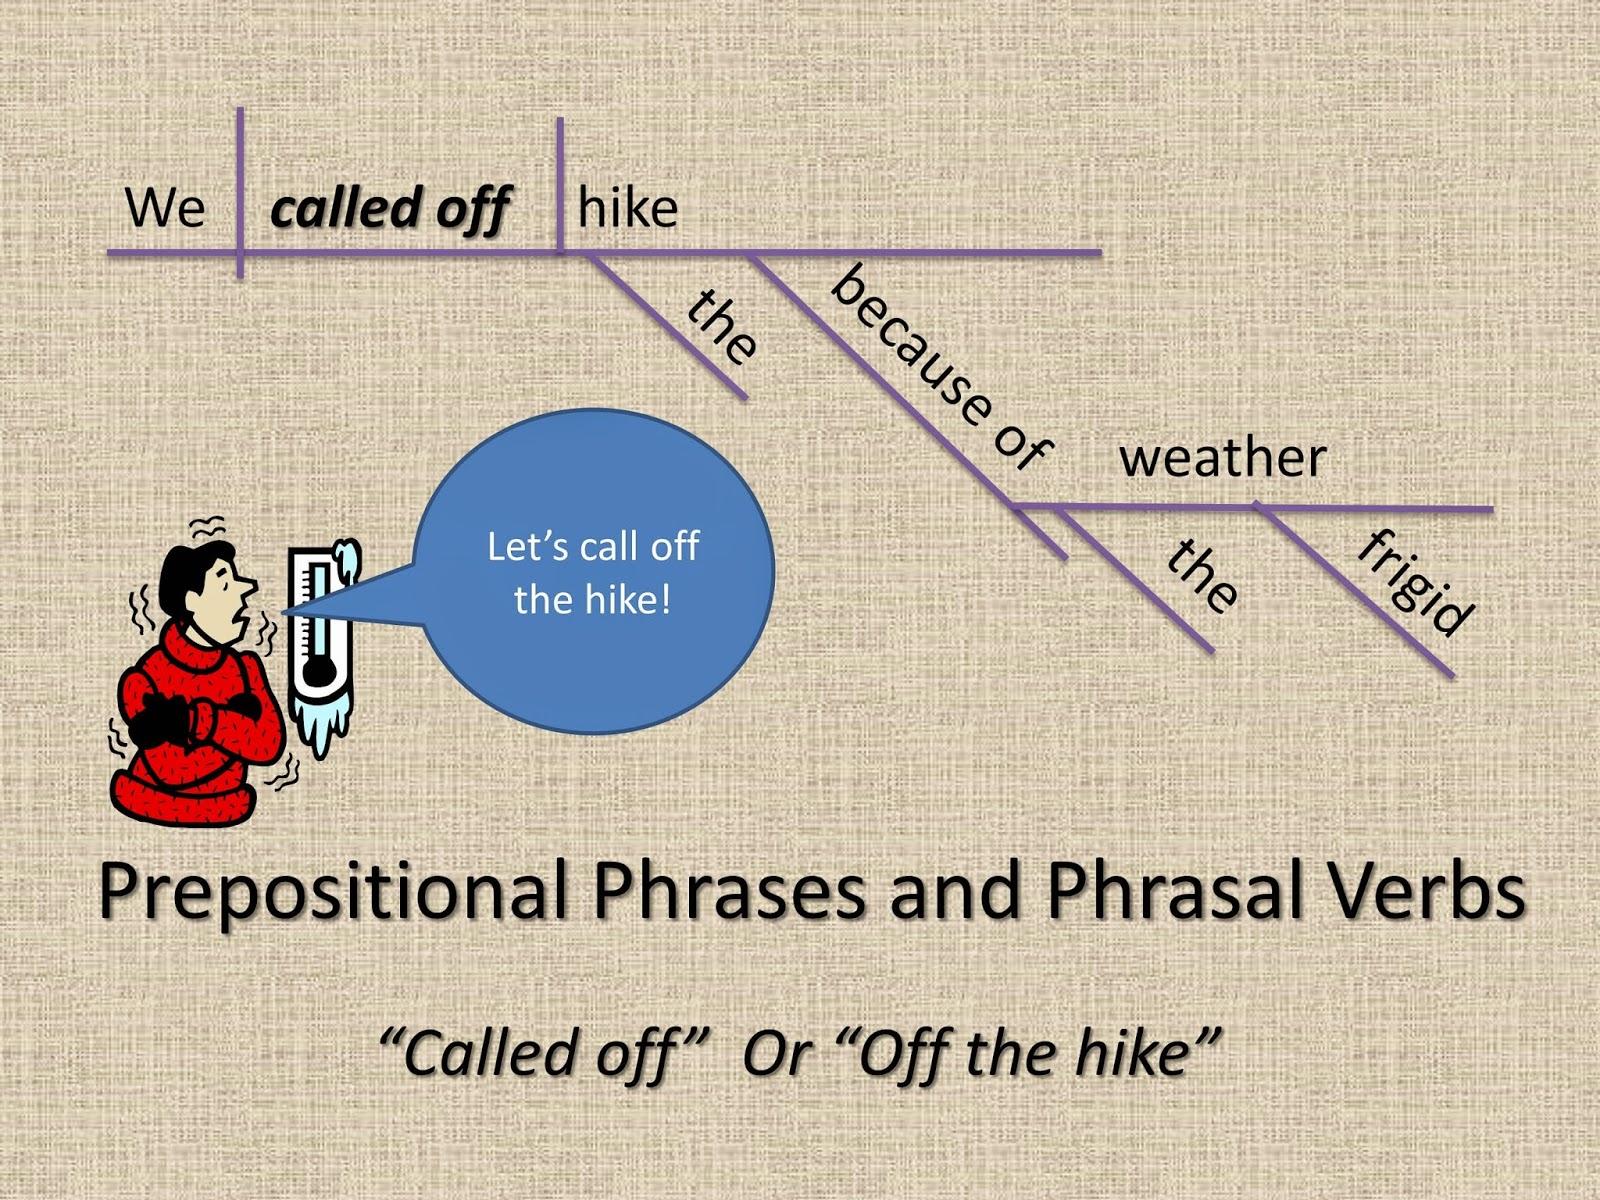 Sentence With Prepositional Phrase Diagram 1983 Chevrolet C10 Wiring Gypsy Daughter Essays Or Phrasal Verb